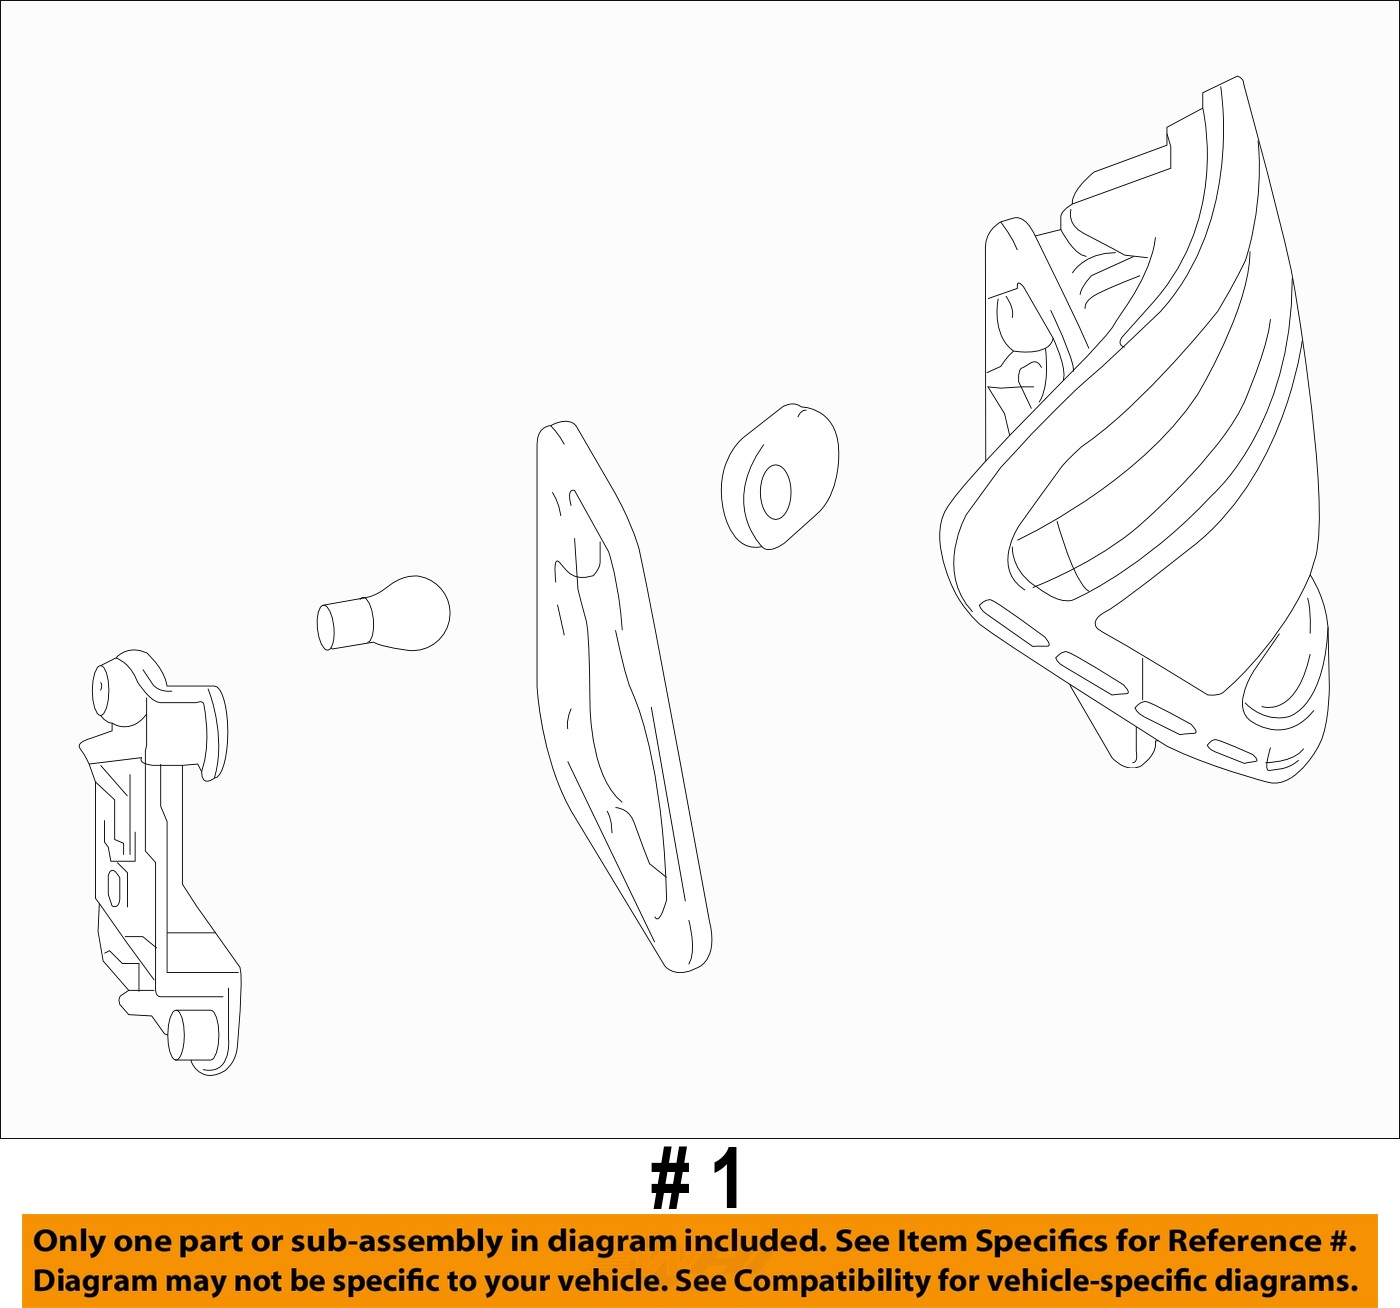 mercedes benz glk350 parts diagram  mercedes  auto wiring